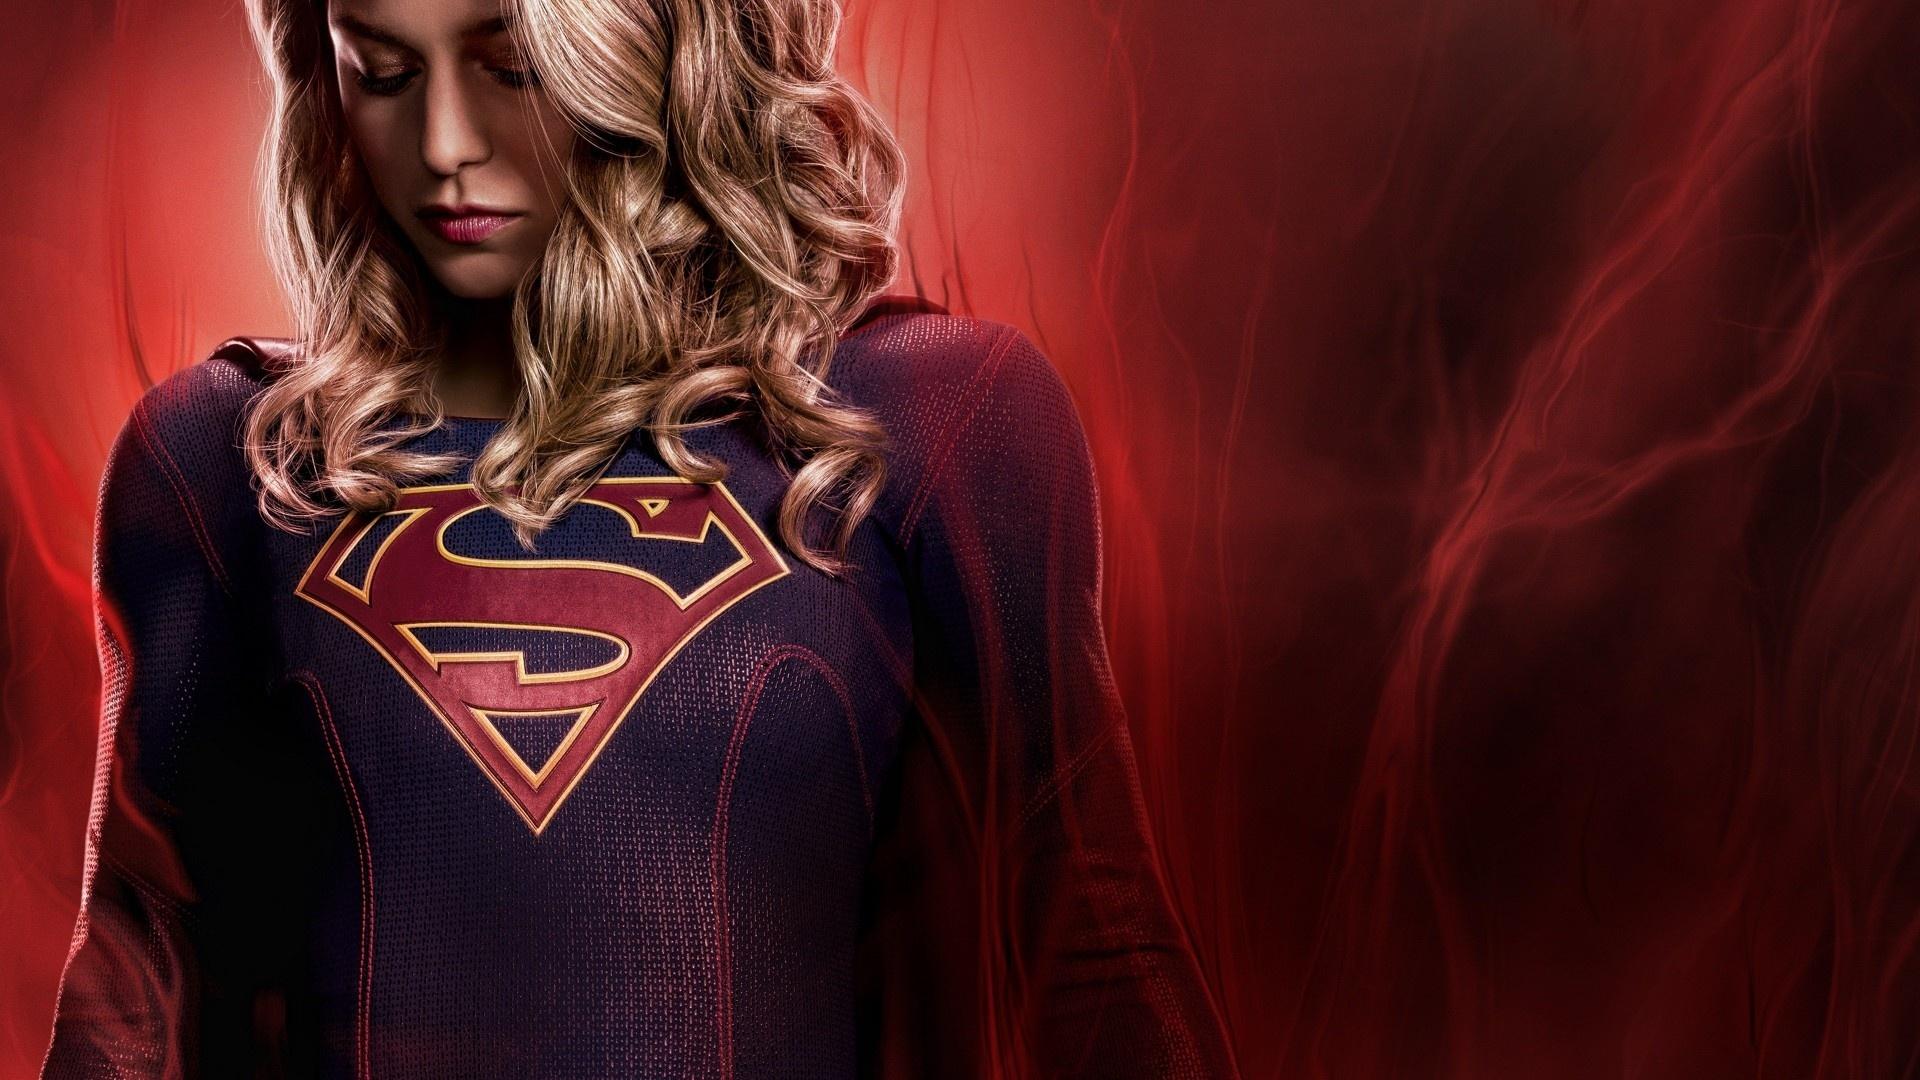 Supergirl free pic